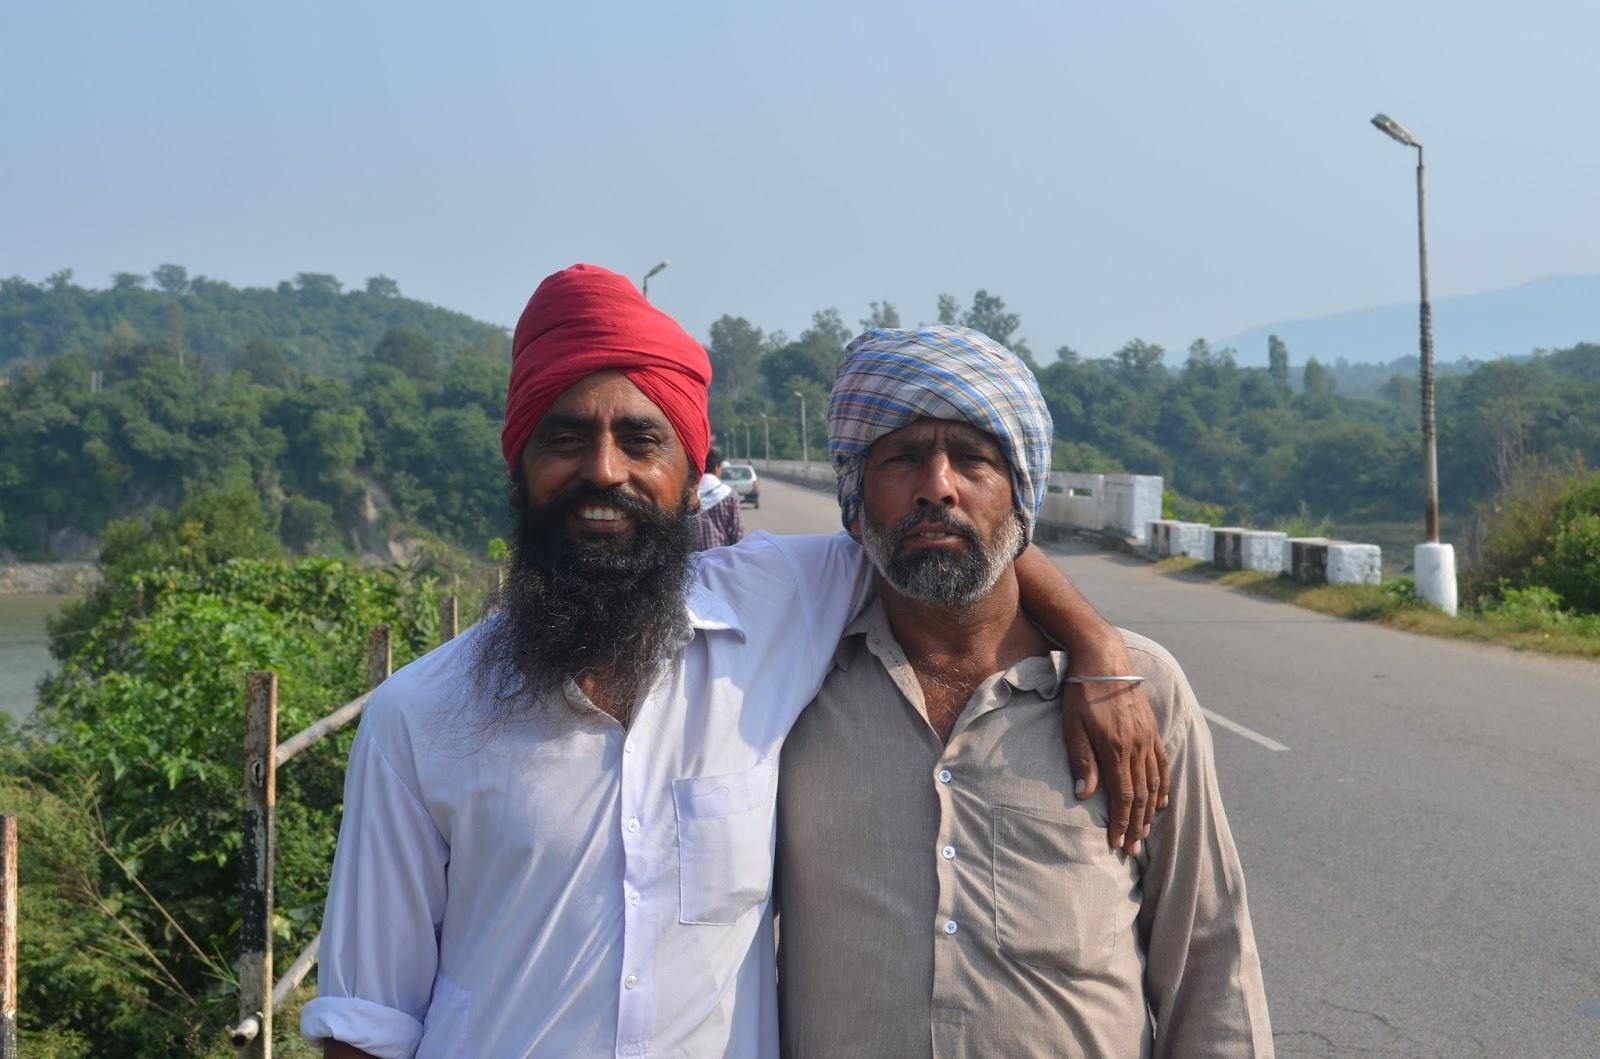 strangers but friends on my journey